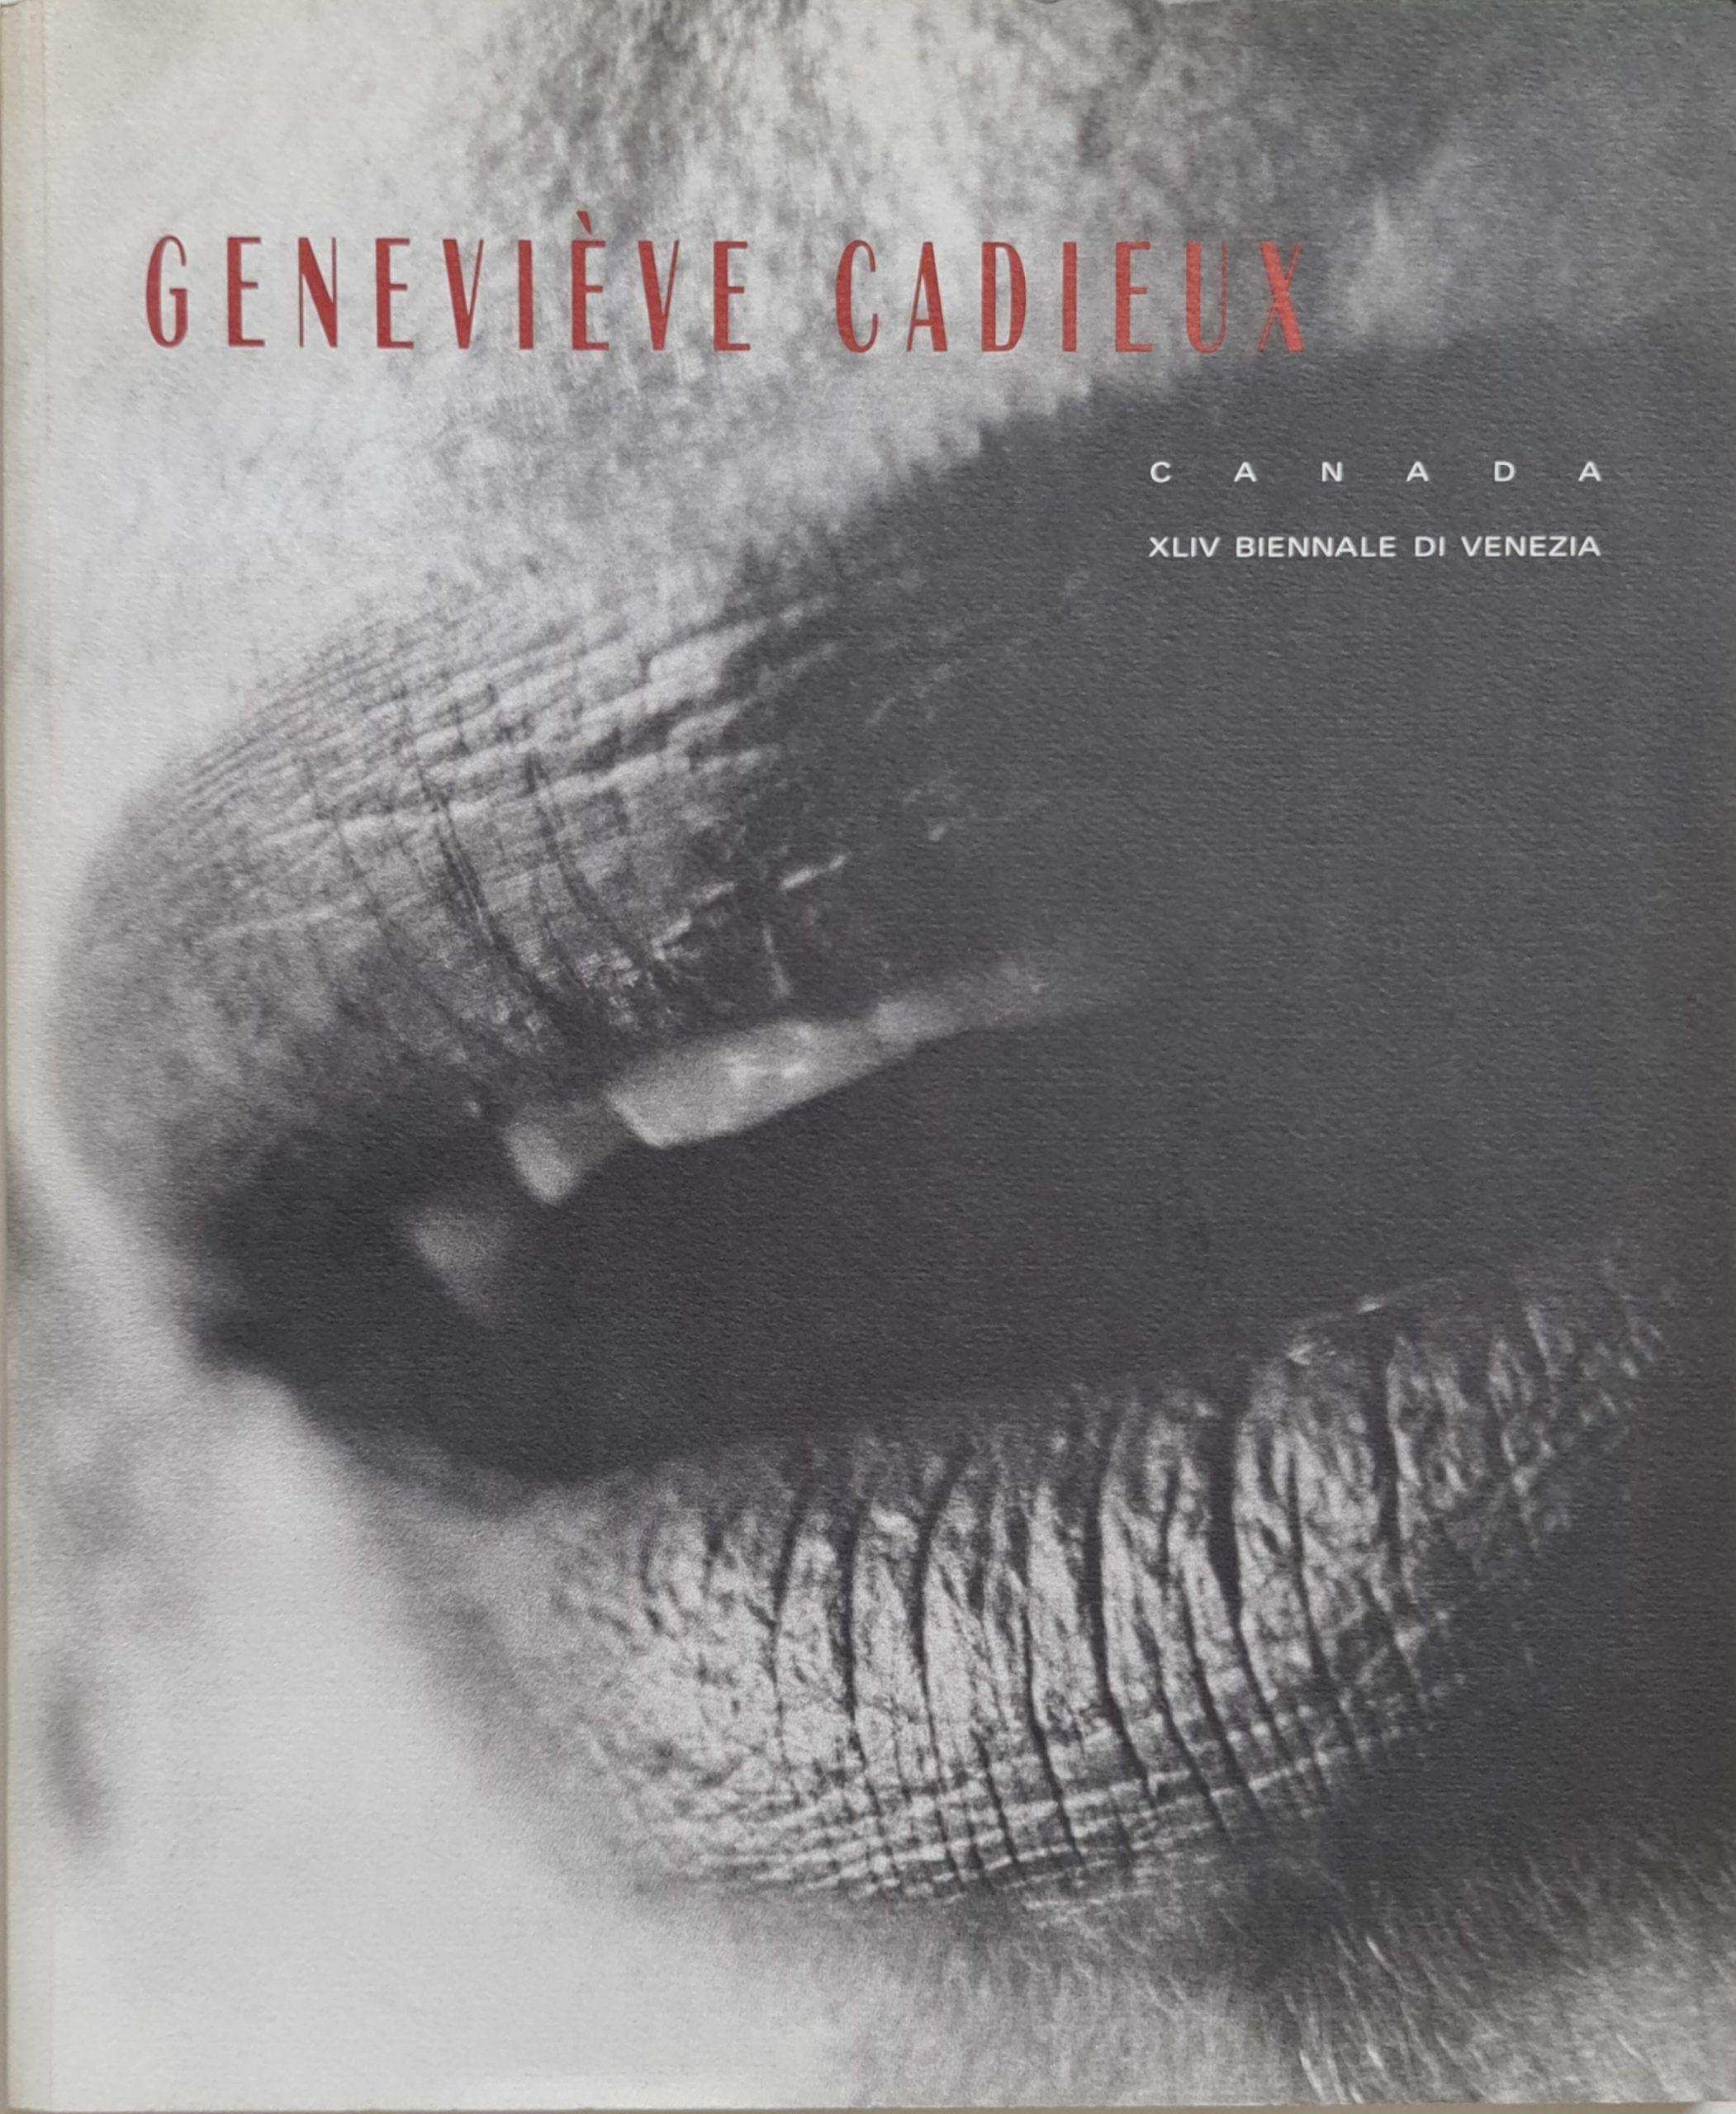 Genevieve Cadieux Canada XLIV Biennale di Venezia Tentoonstellingscatalogus 27-06-1990 30-09-1990 Taal Engels Italiaans Frans1990 ISBN 2-920284-10-x isbn 292028410x ISBN 9782920284104 skoander.com